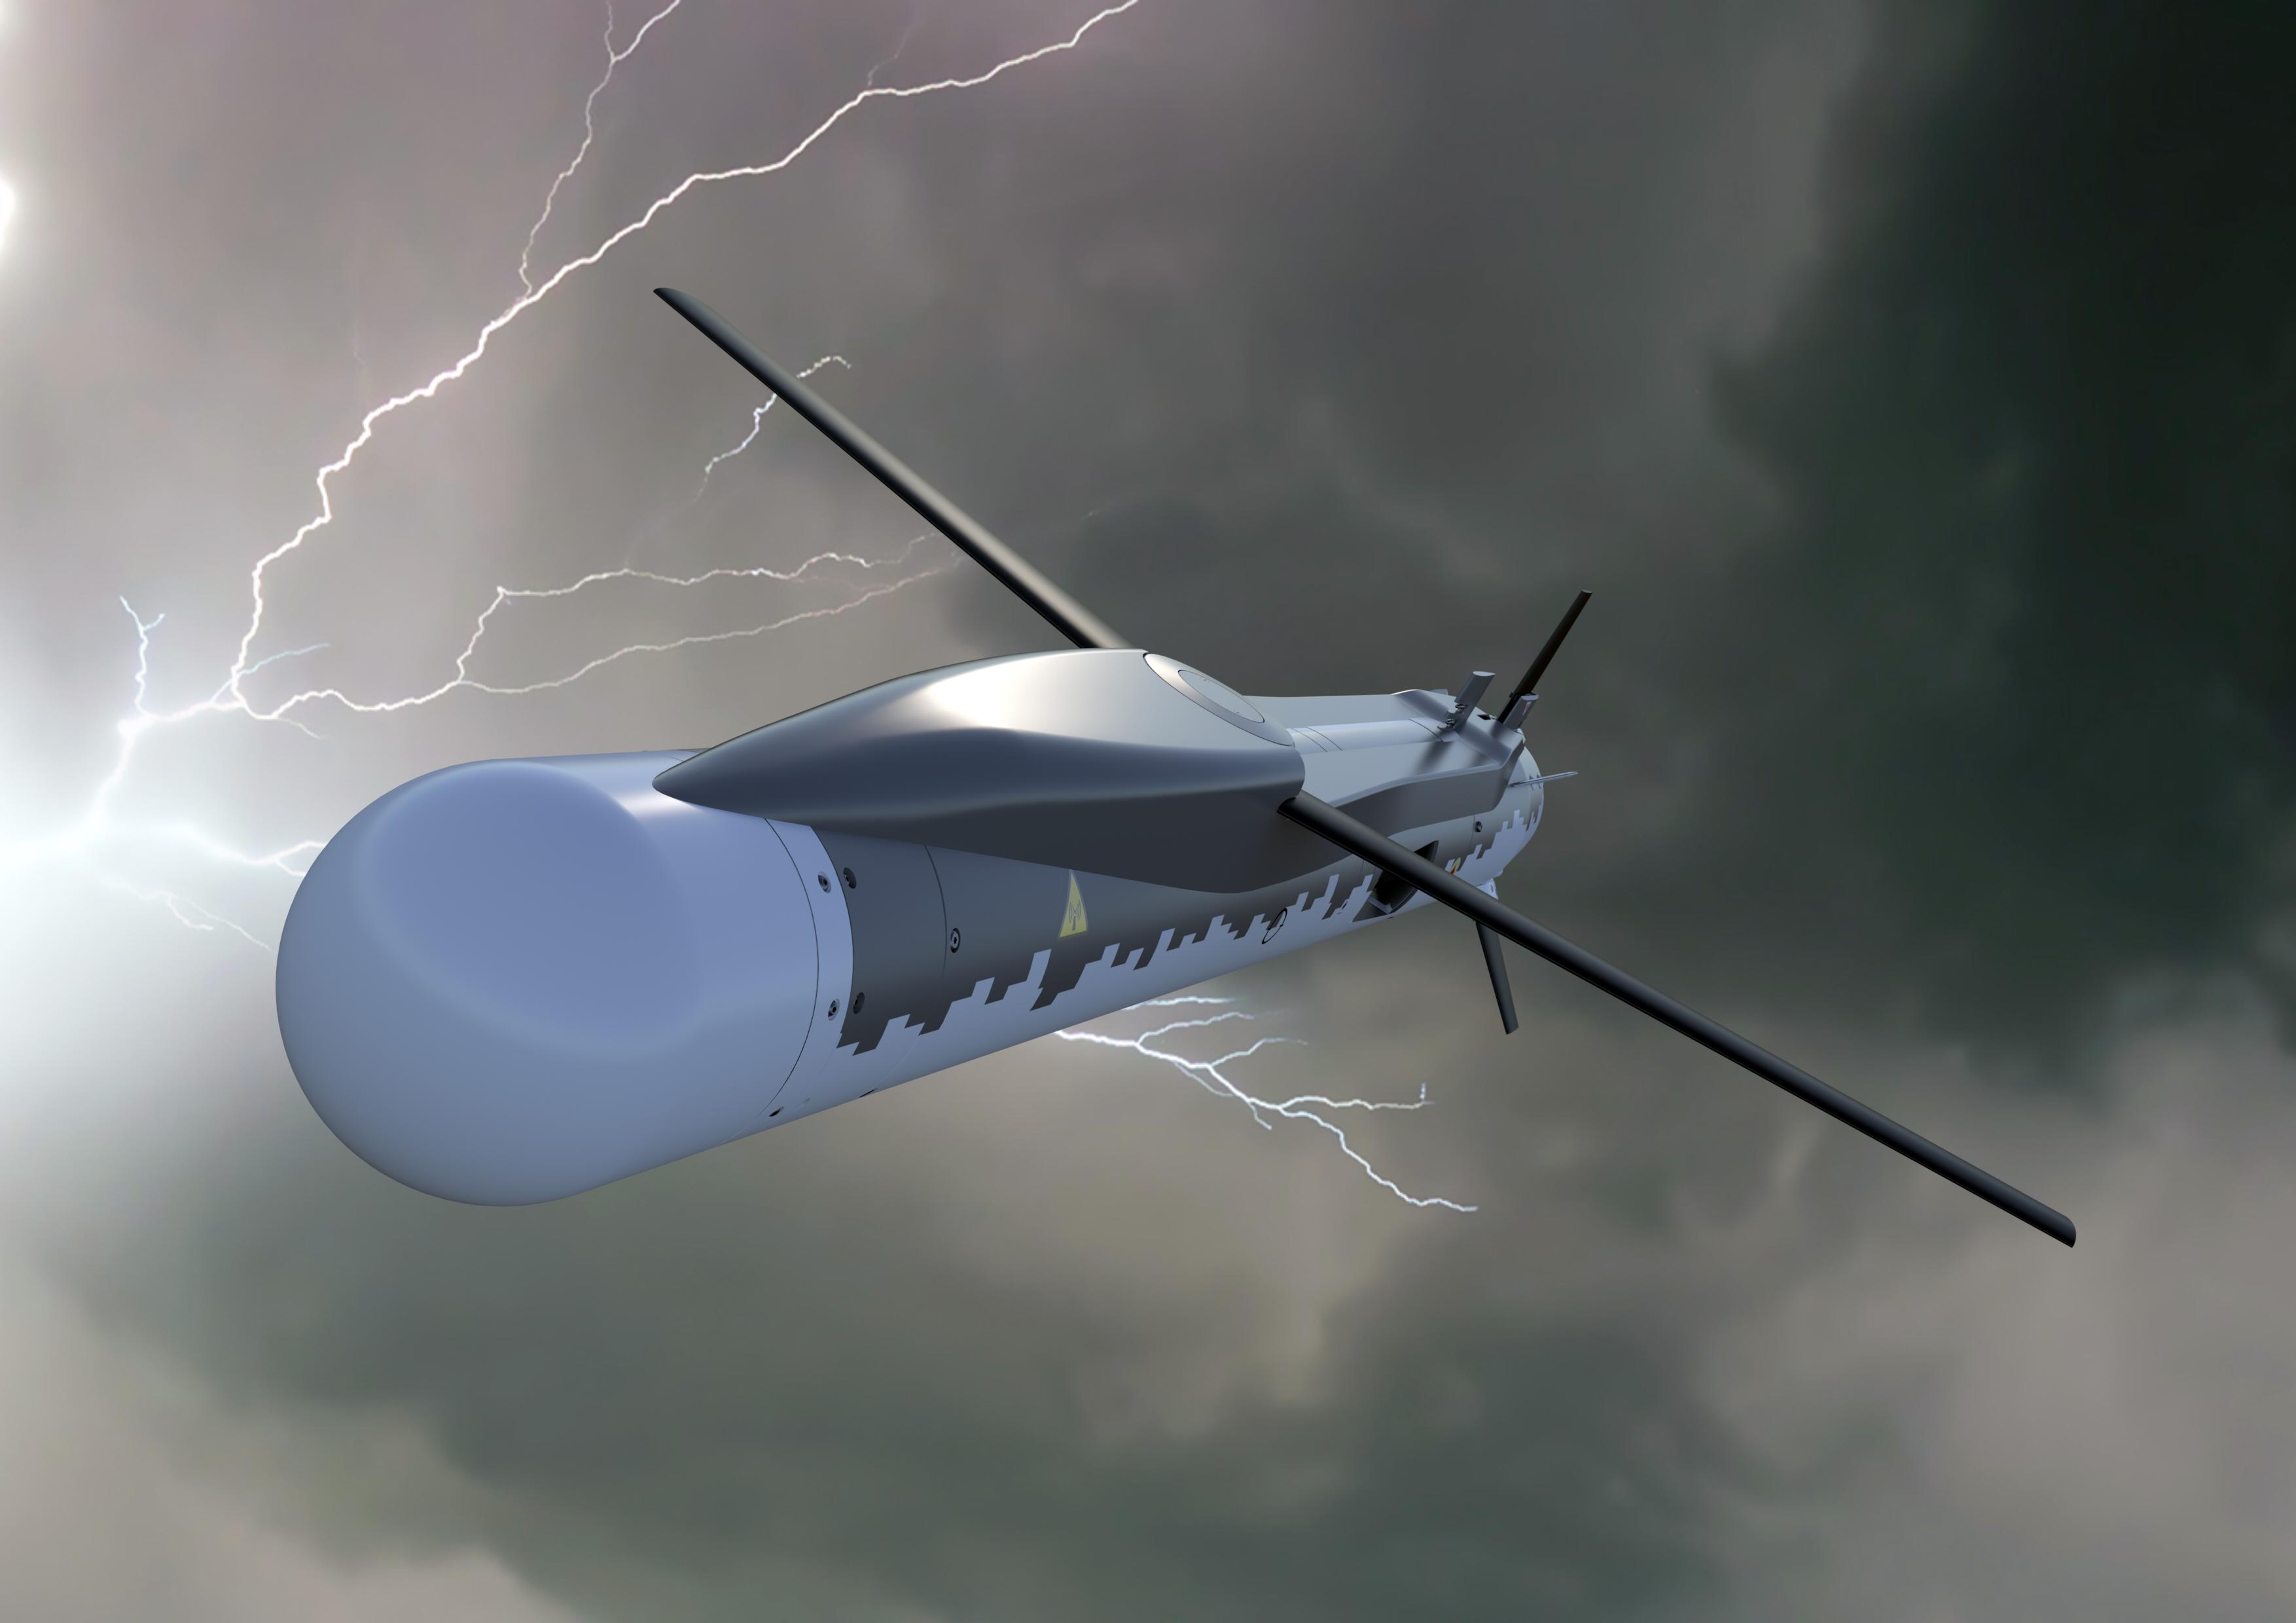 MBDA working on new SPEAR-EW electronic warfare weapon - MBDA